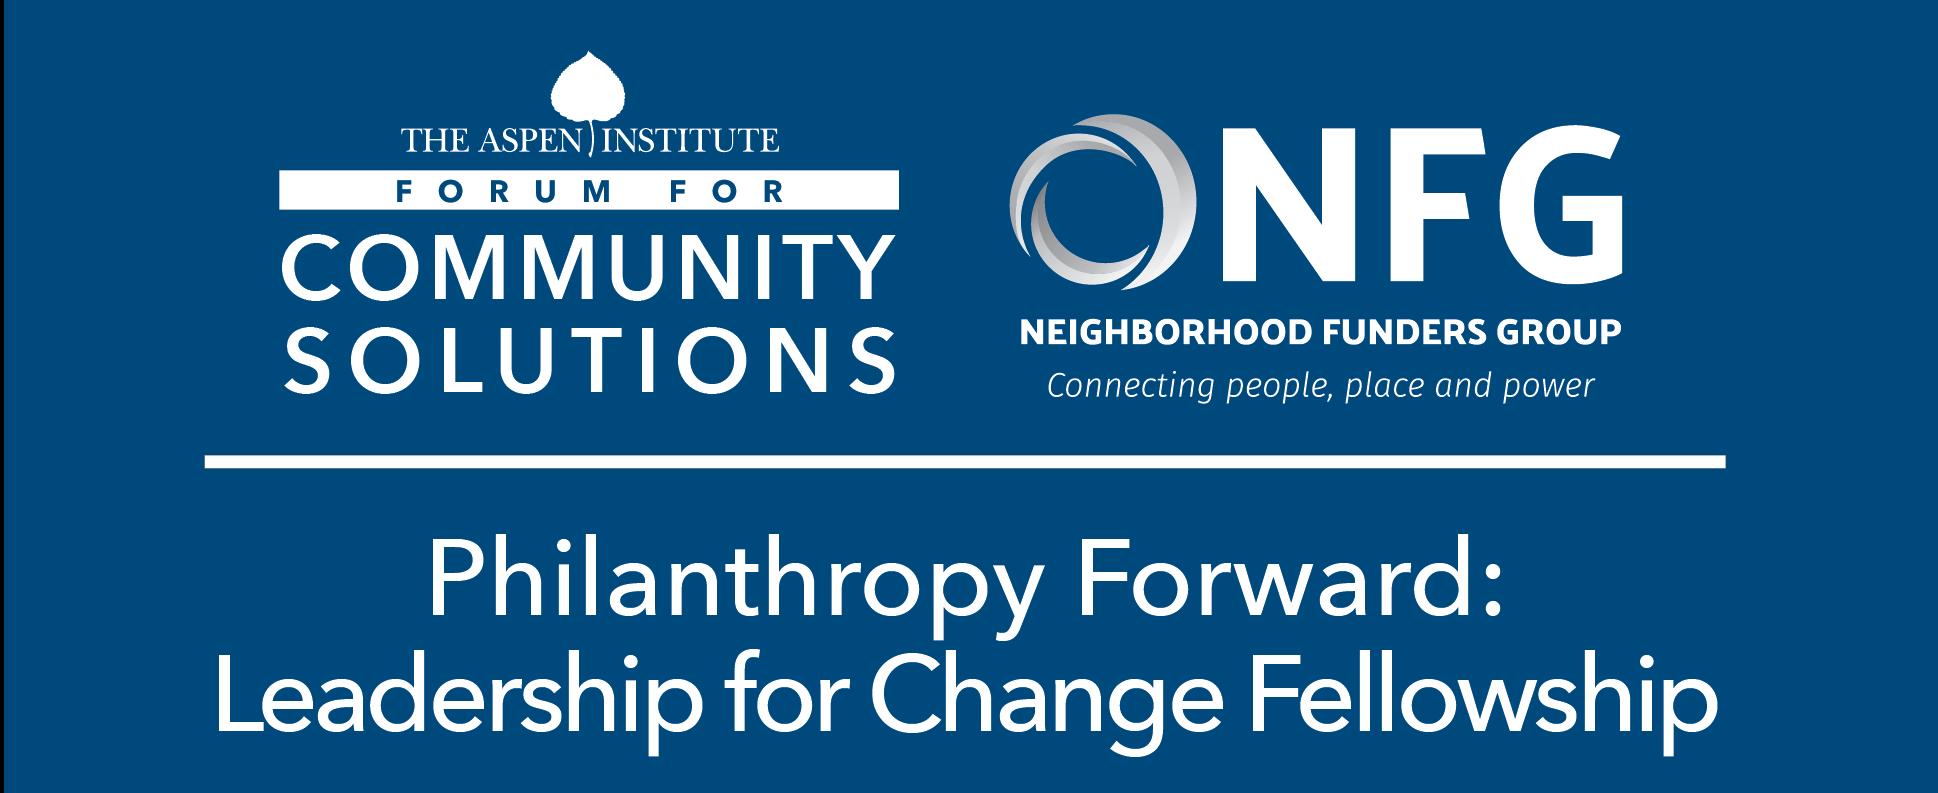 Philanthropy_Forward_Blue.png